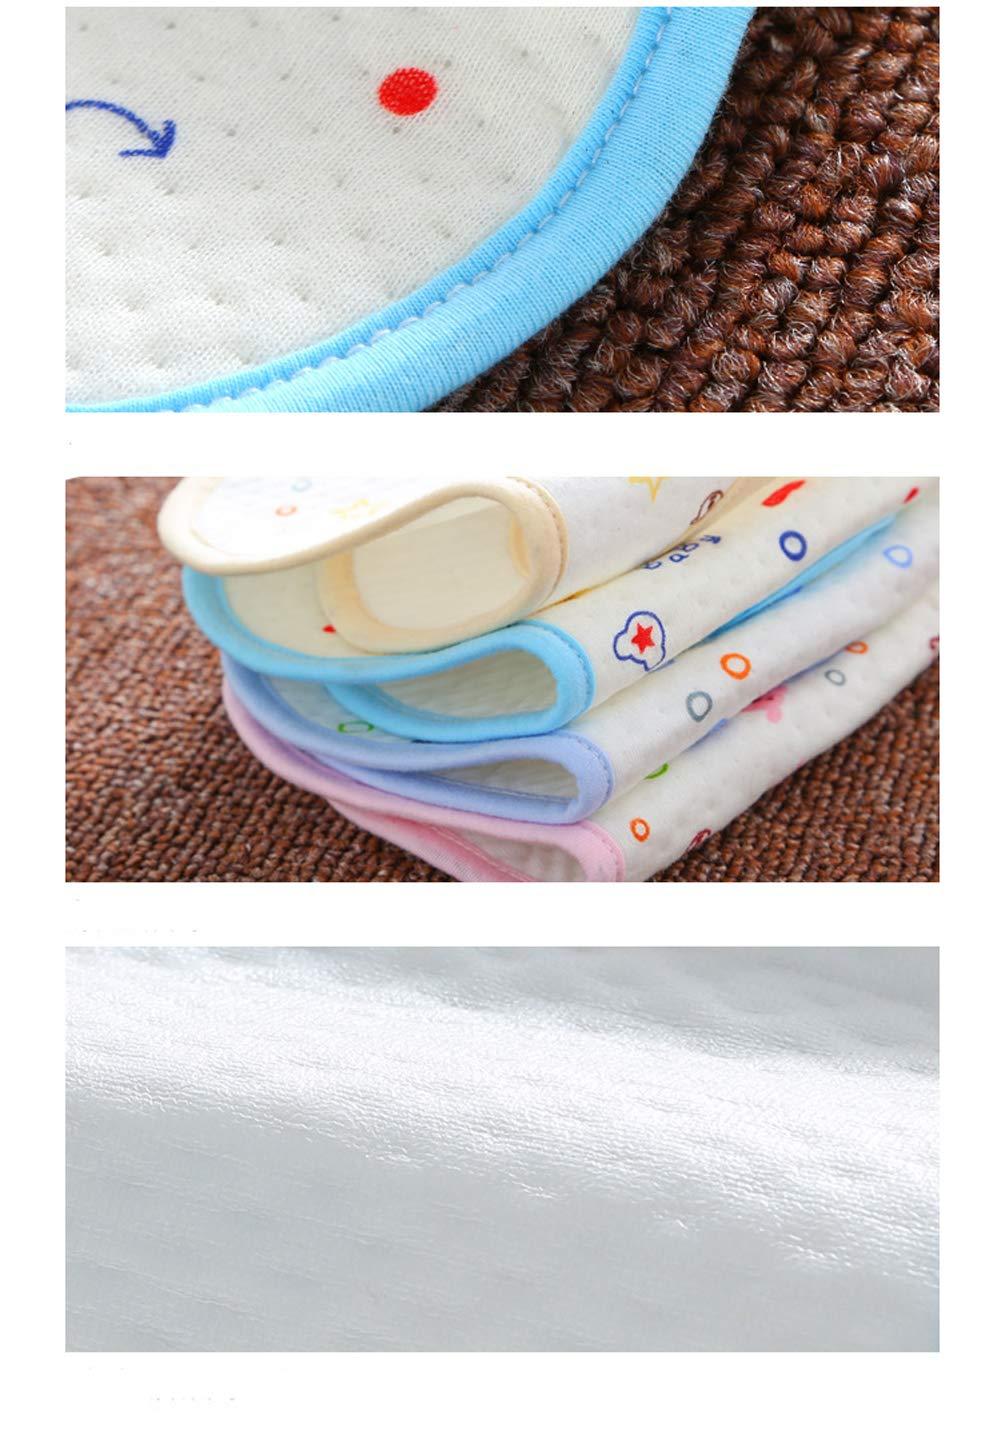 general ni/ña babero y dentici/ón bufanda babero arn/és de cableado Chaleco babero Baberos para beb/é Yworld impermeable paquete de 4 lavable